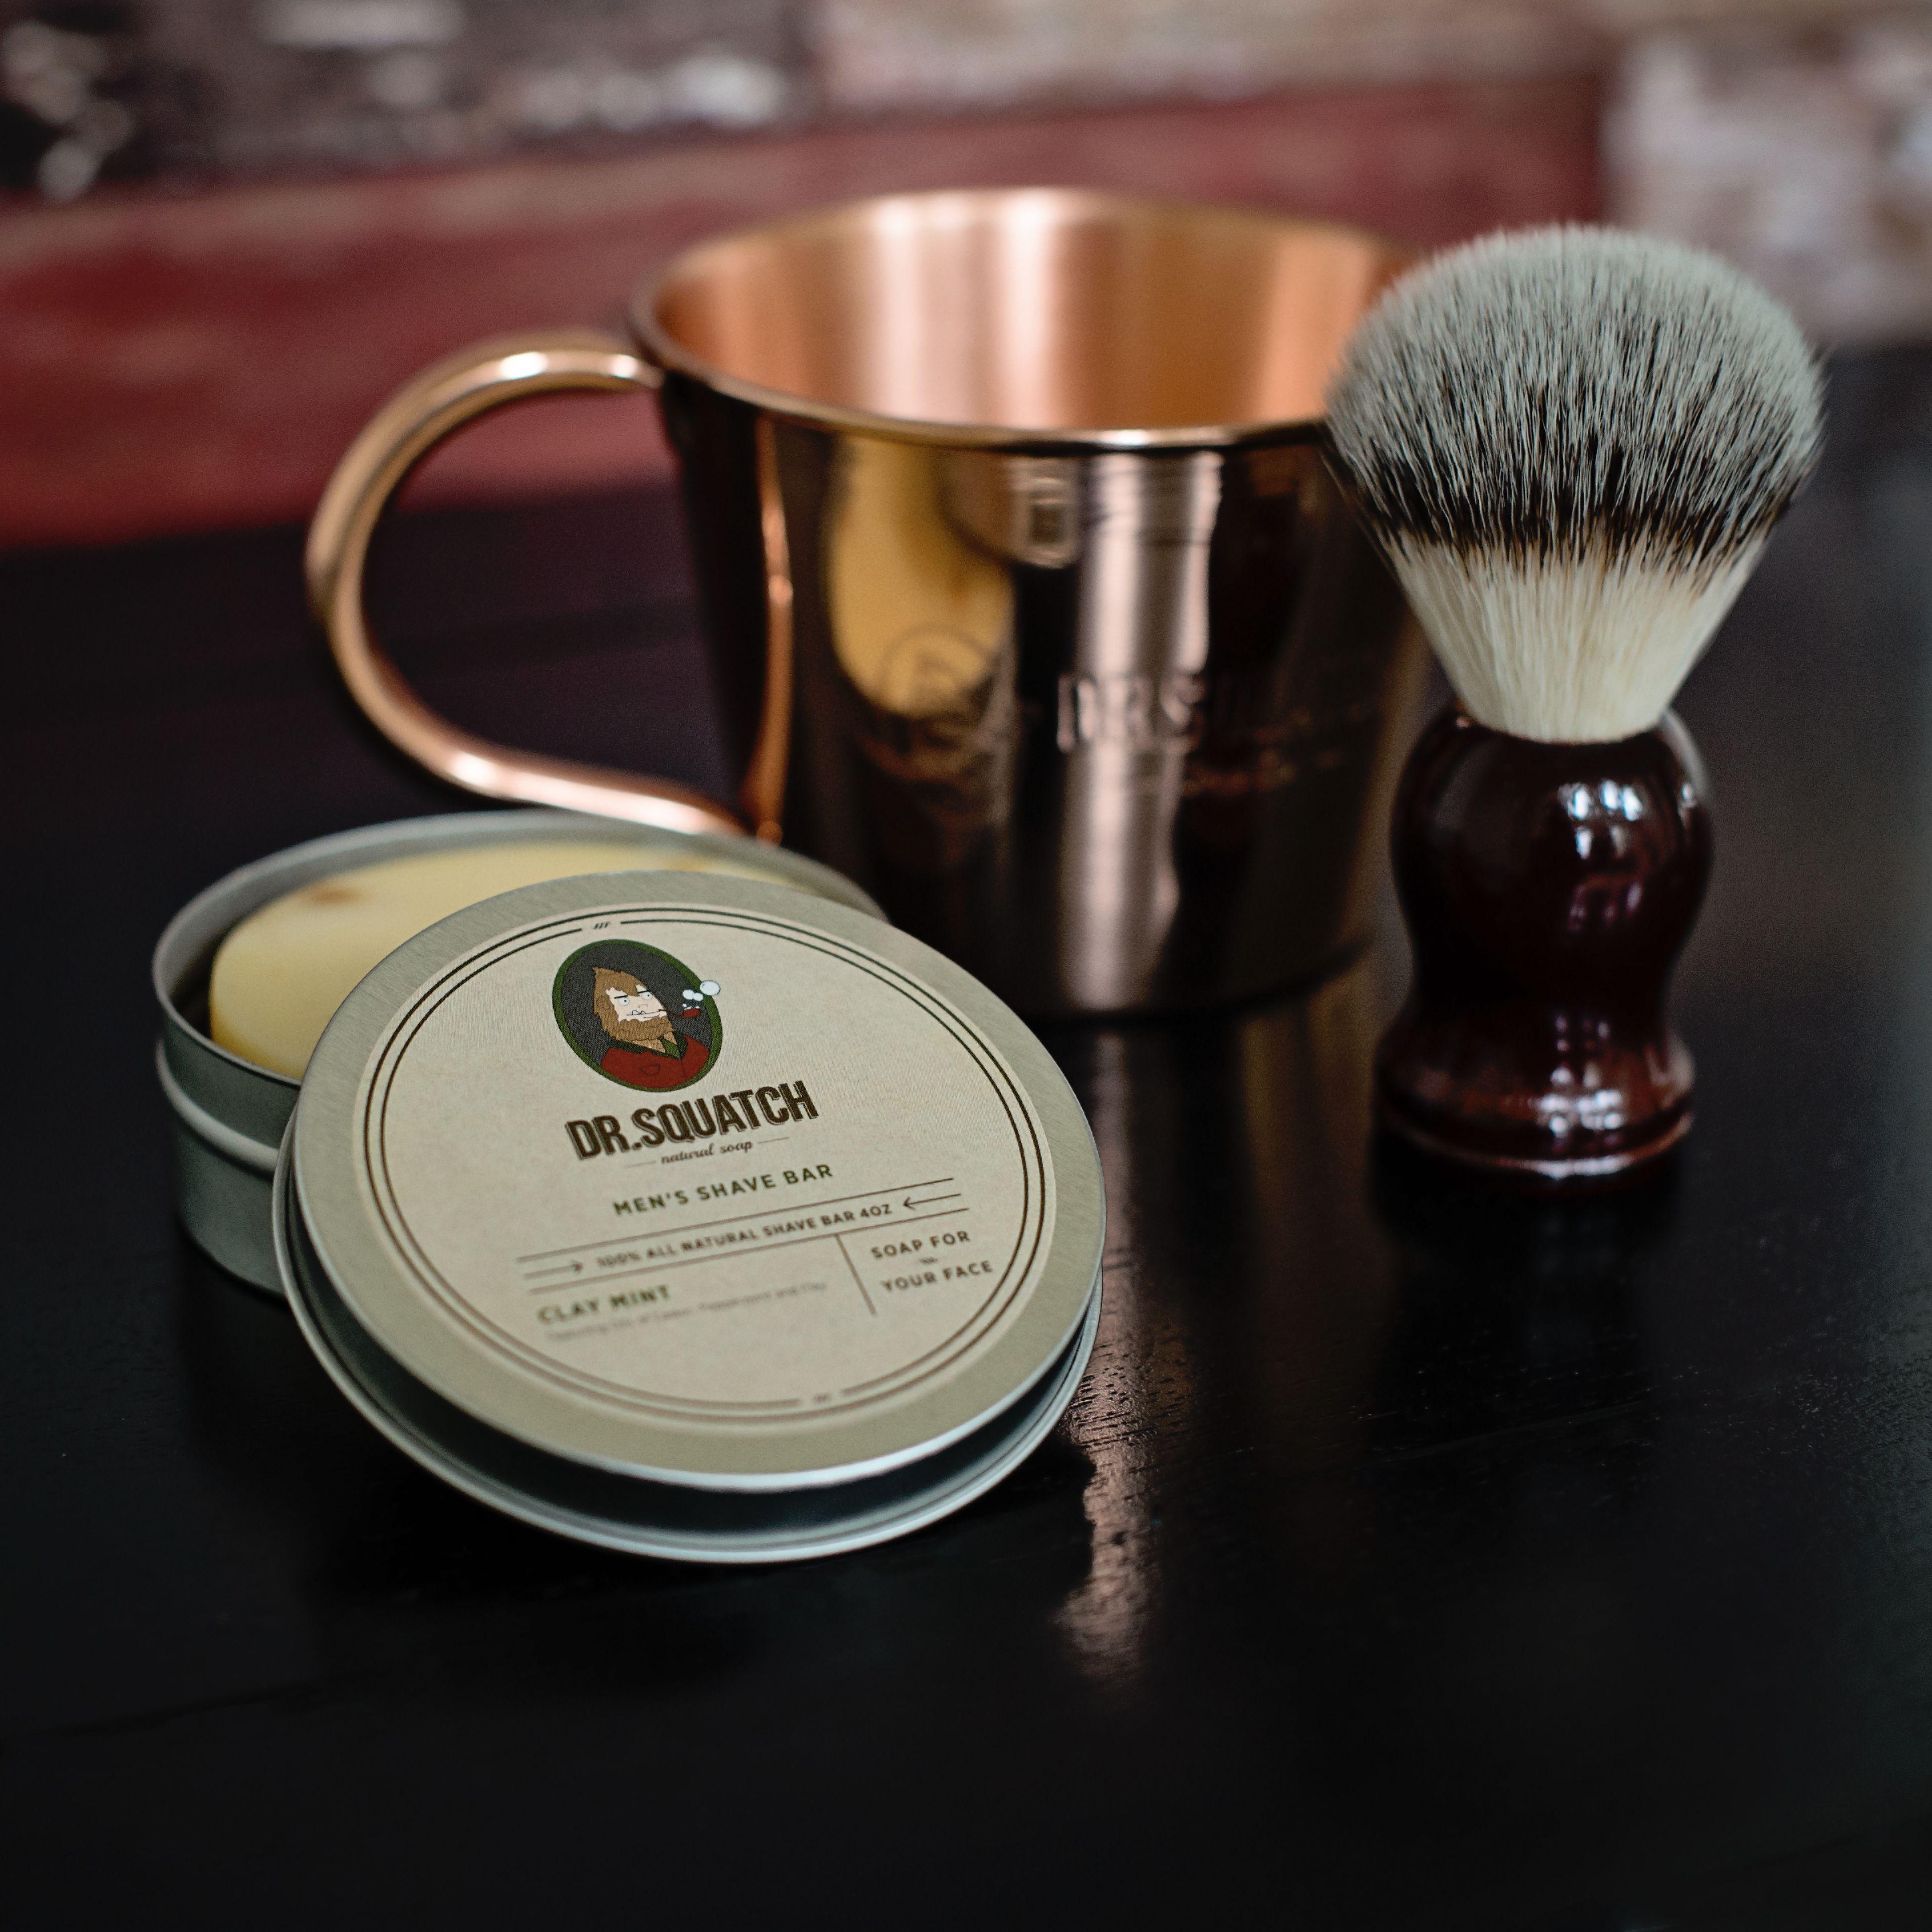 Dr squatch shave kit traditionalshaving shavesoap